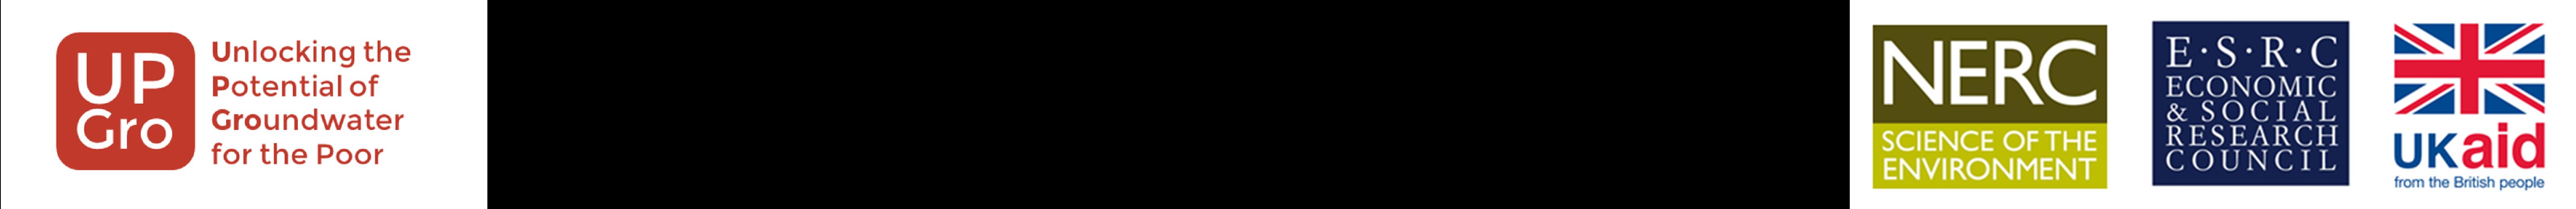 UPGro Banner